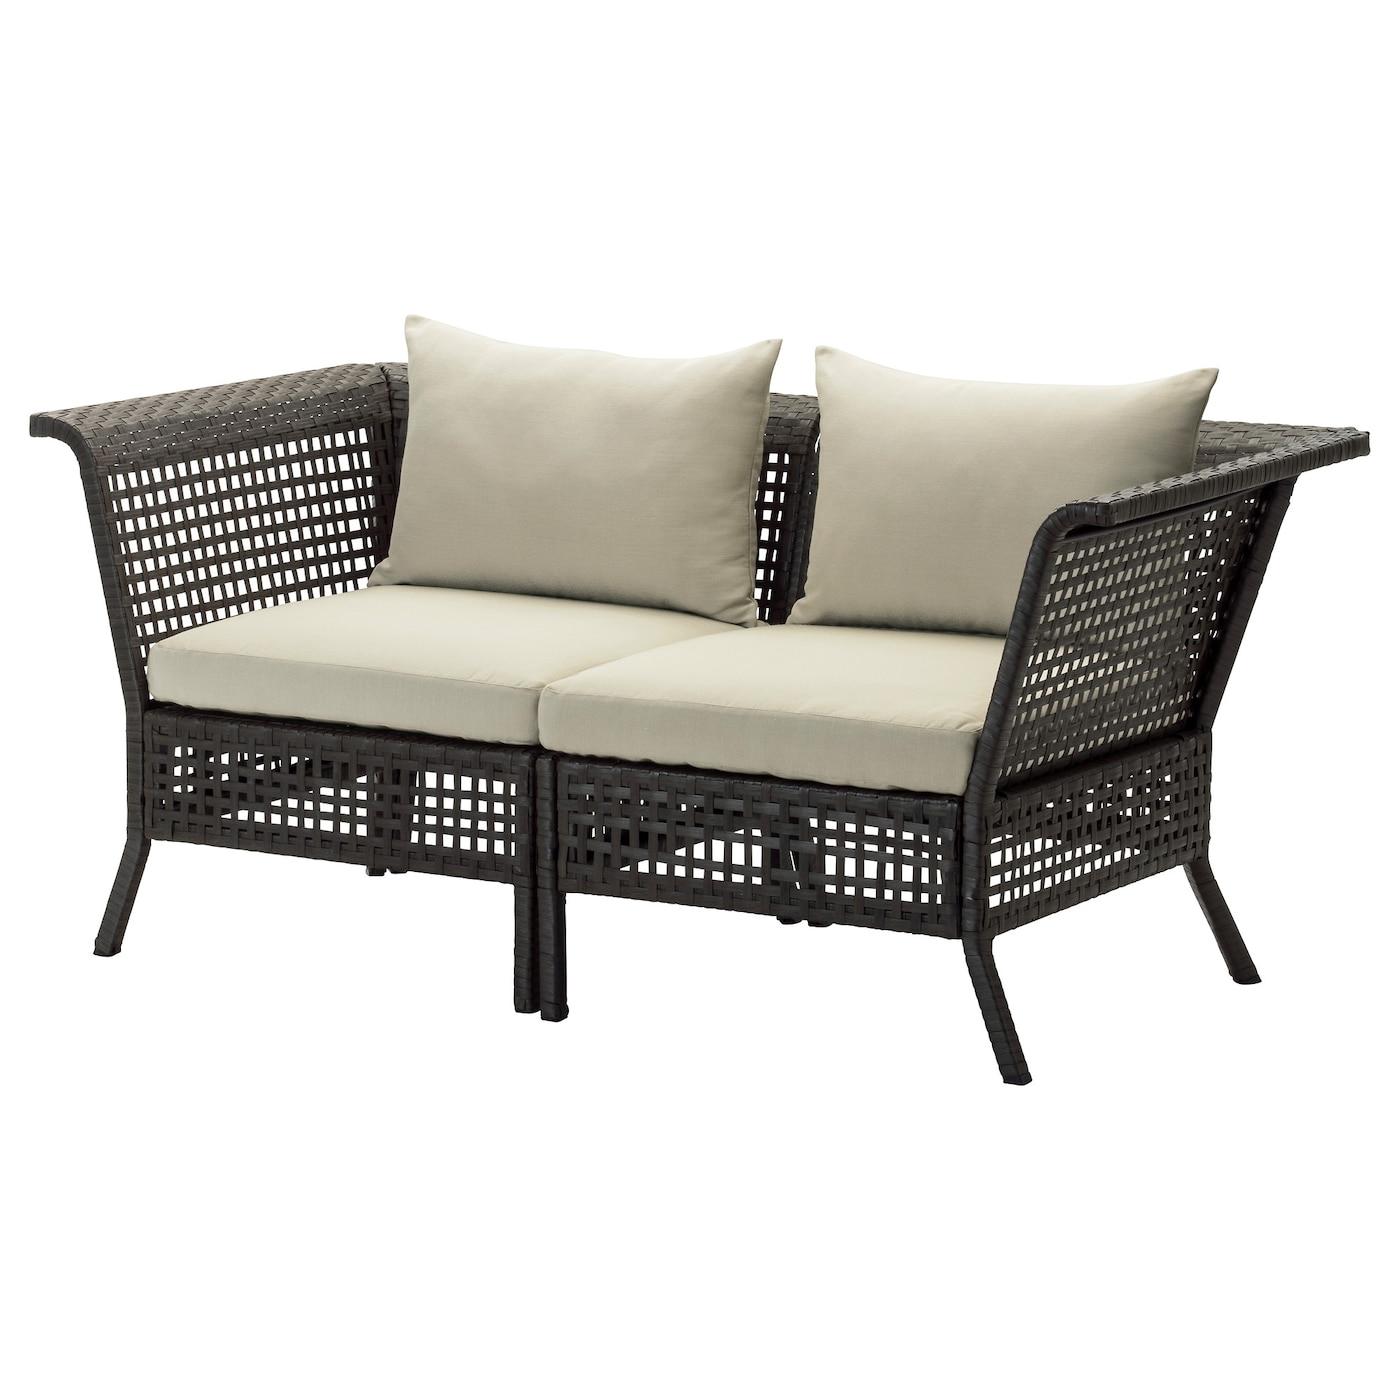 Outdoor Garden Sofas Wooden Rattan Furniture IKEA